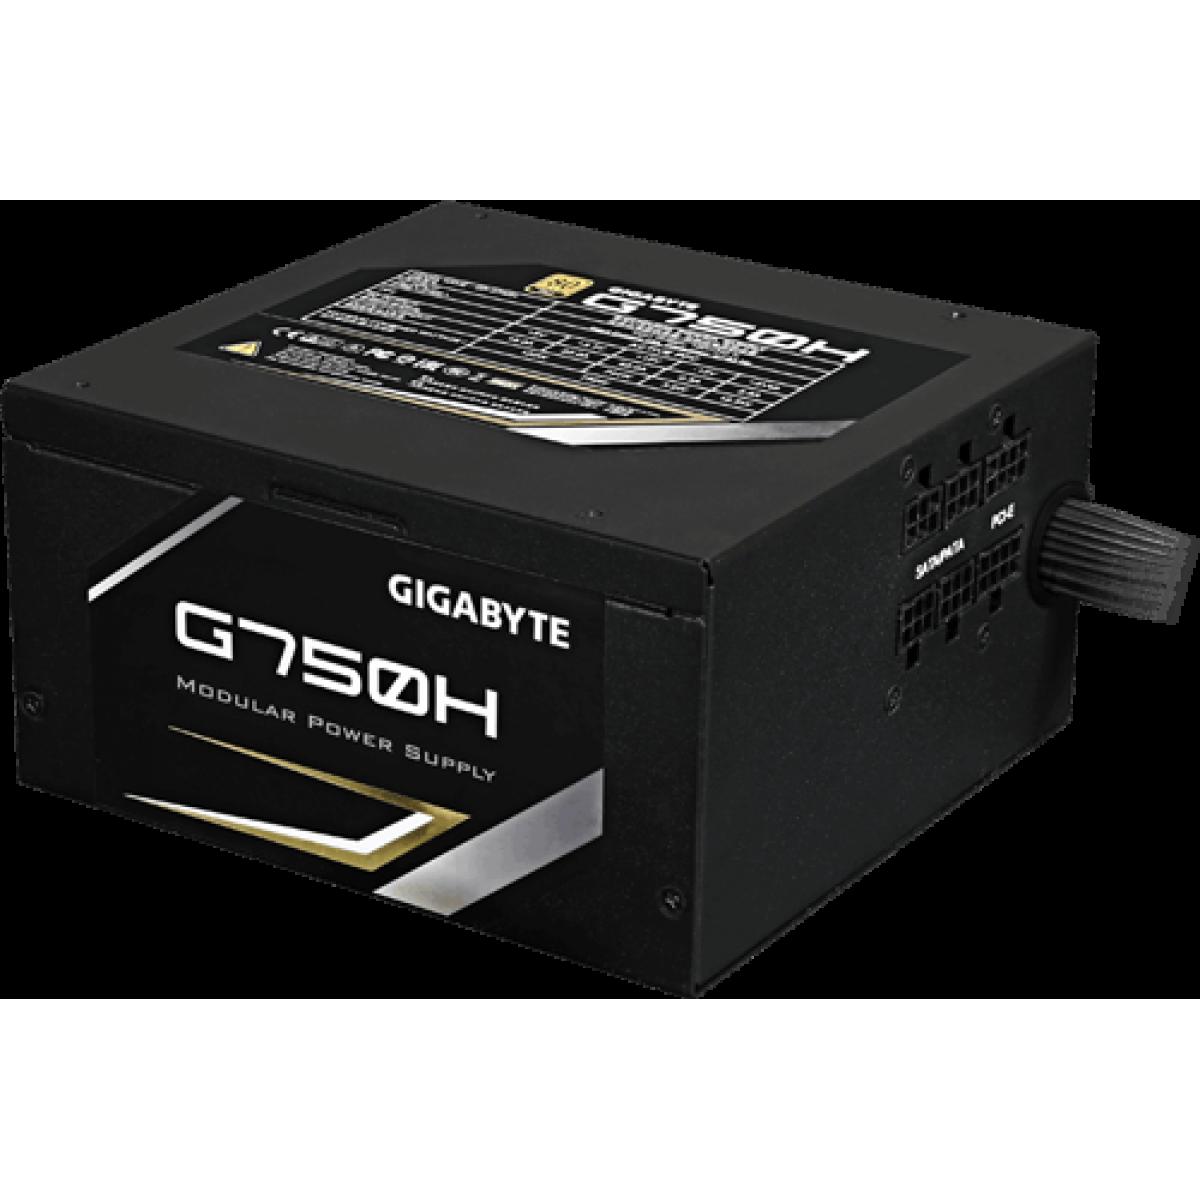 Fonte Gigabyte G750H 750W, 80 Plus Gold, PFC Ativo, Semi Modular, GP-G750H